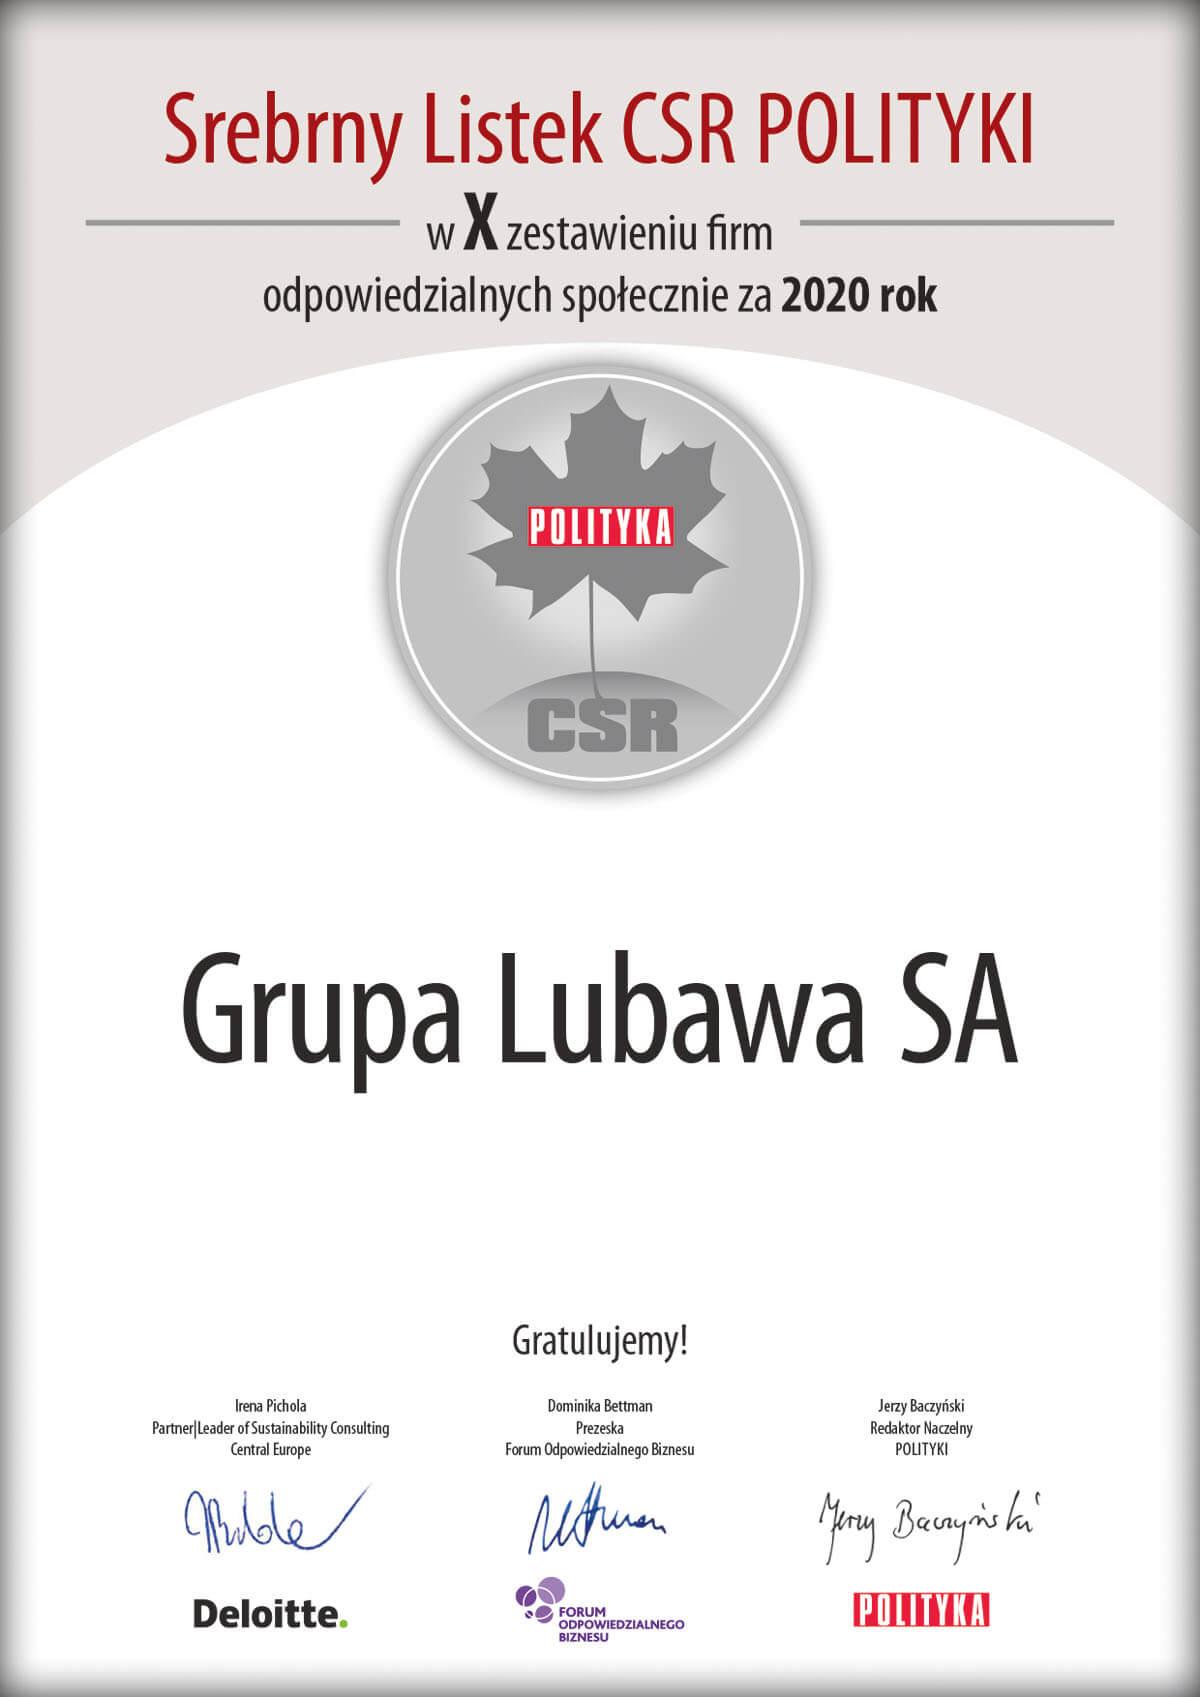 Srebrny Listek CSR dla Grupy Lubawa